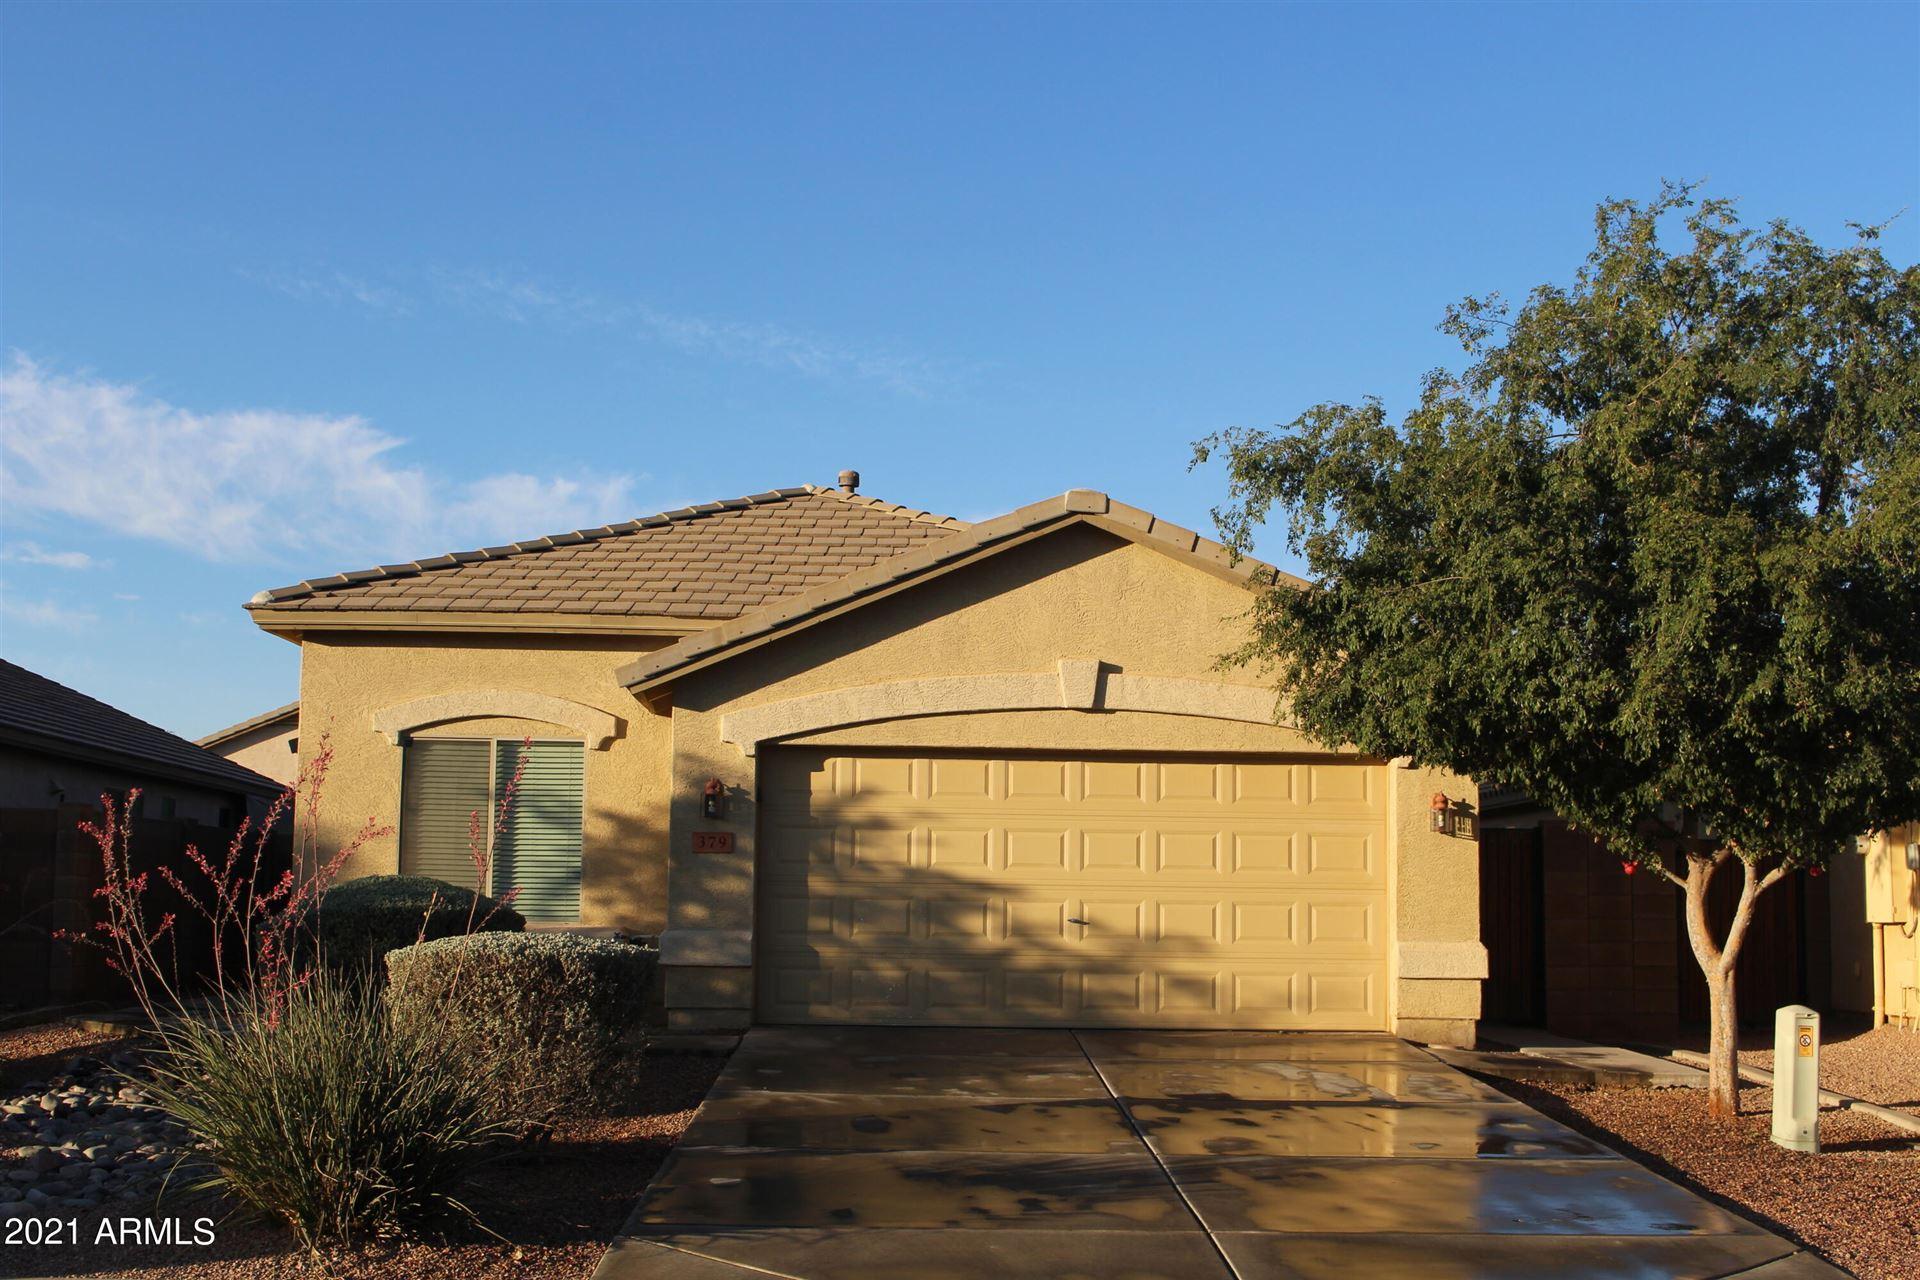 Photo of 379 W HOLSTEIN Trail, San Tan Valley, AZ 85143 (MLS # 6249212)